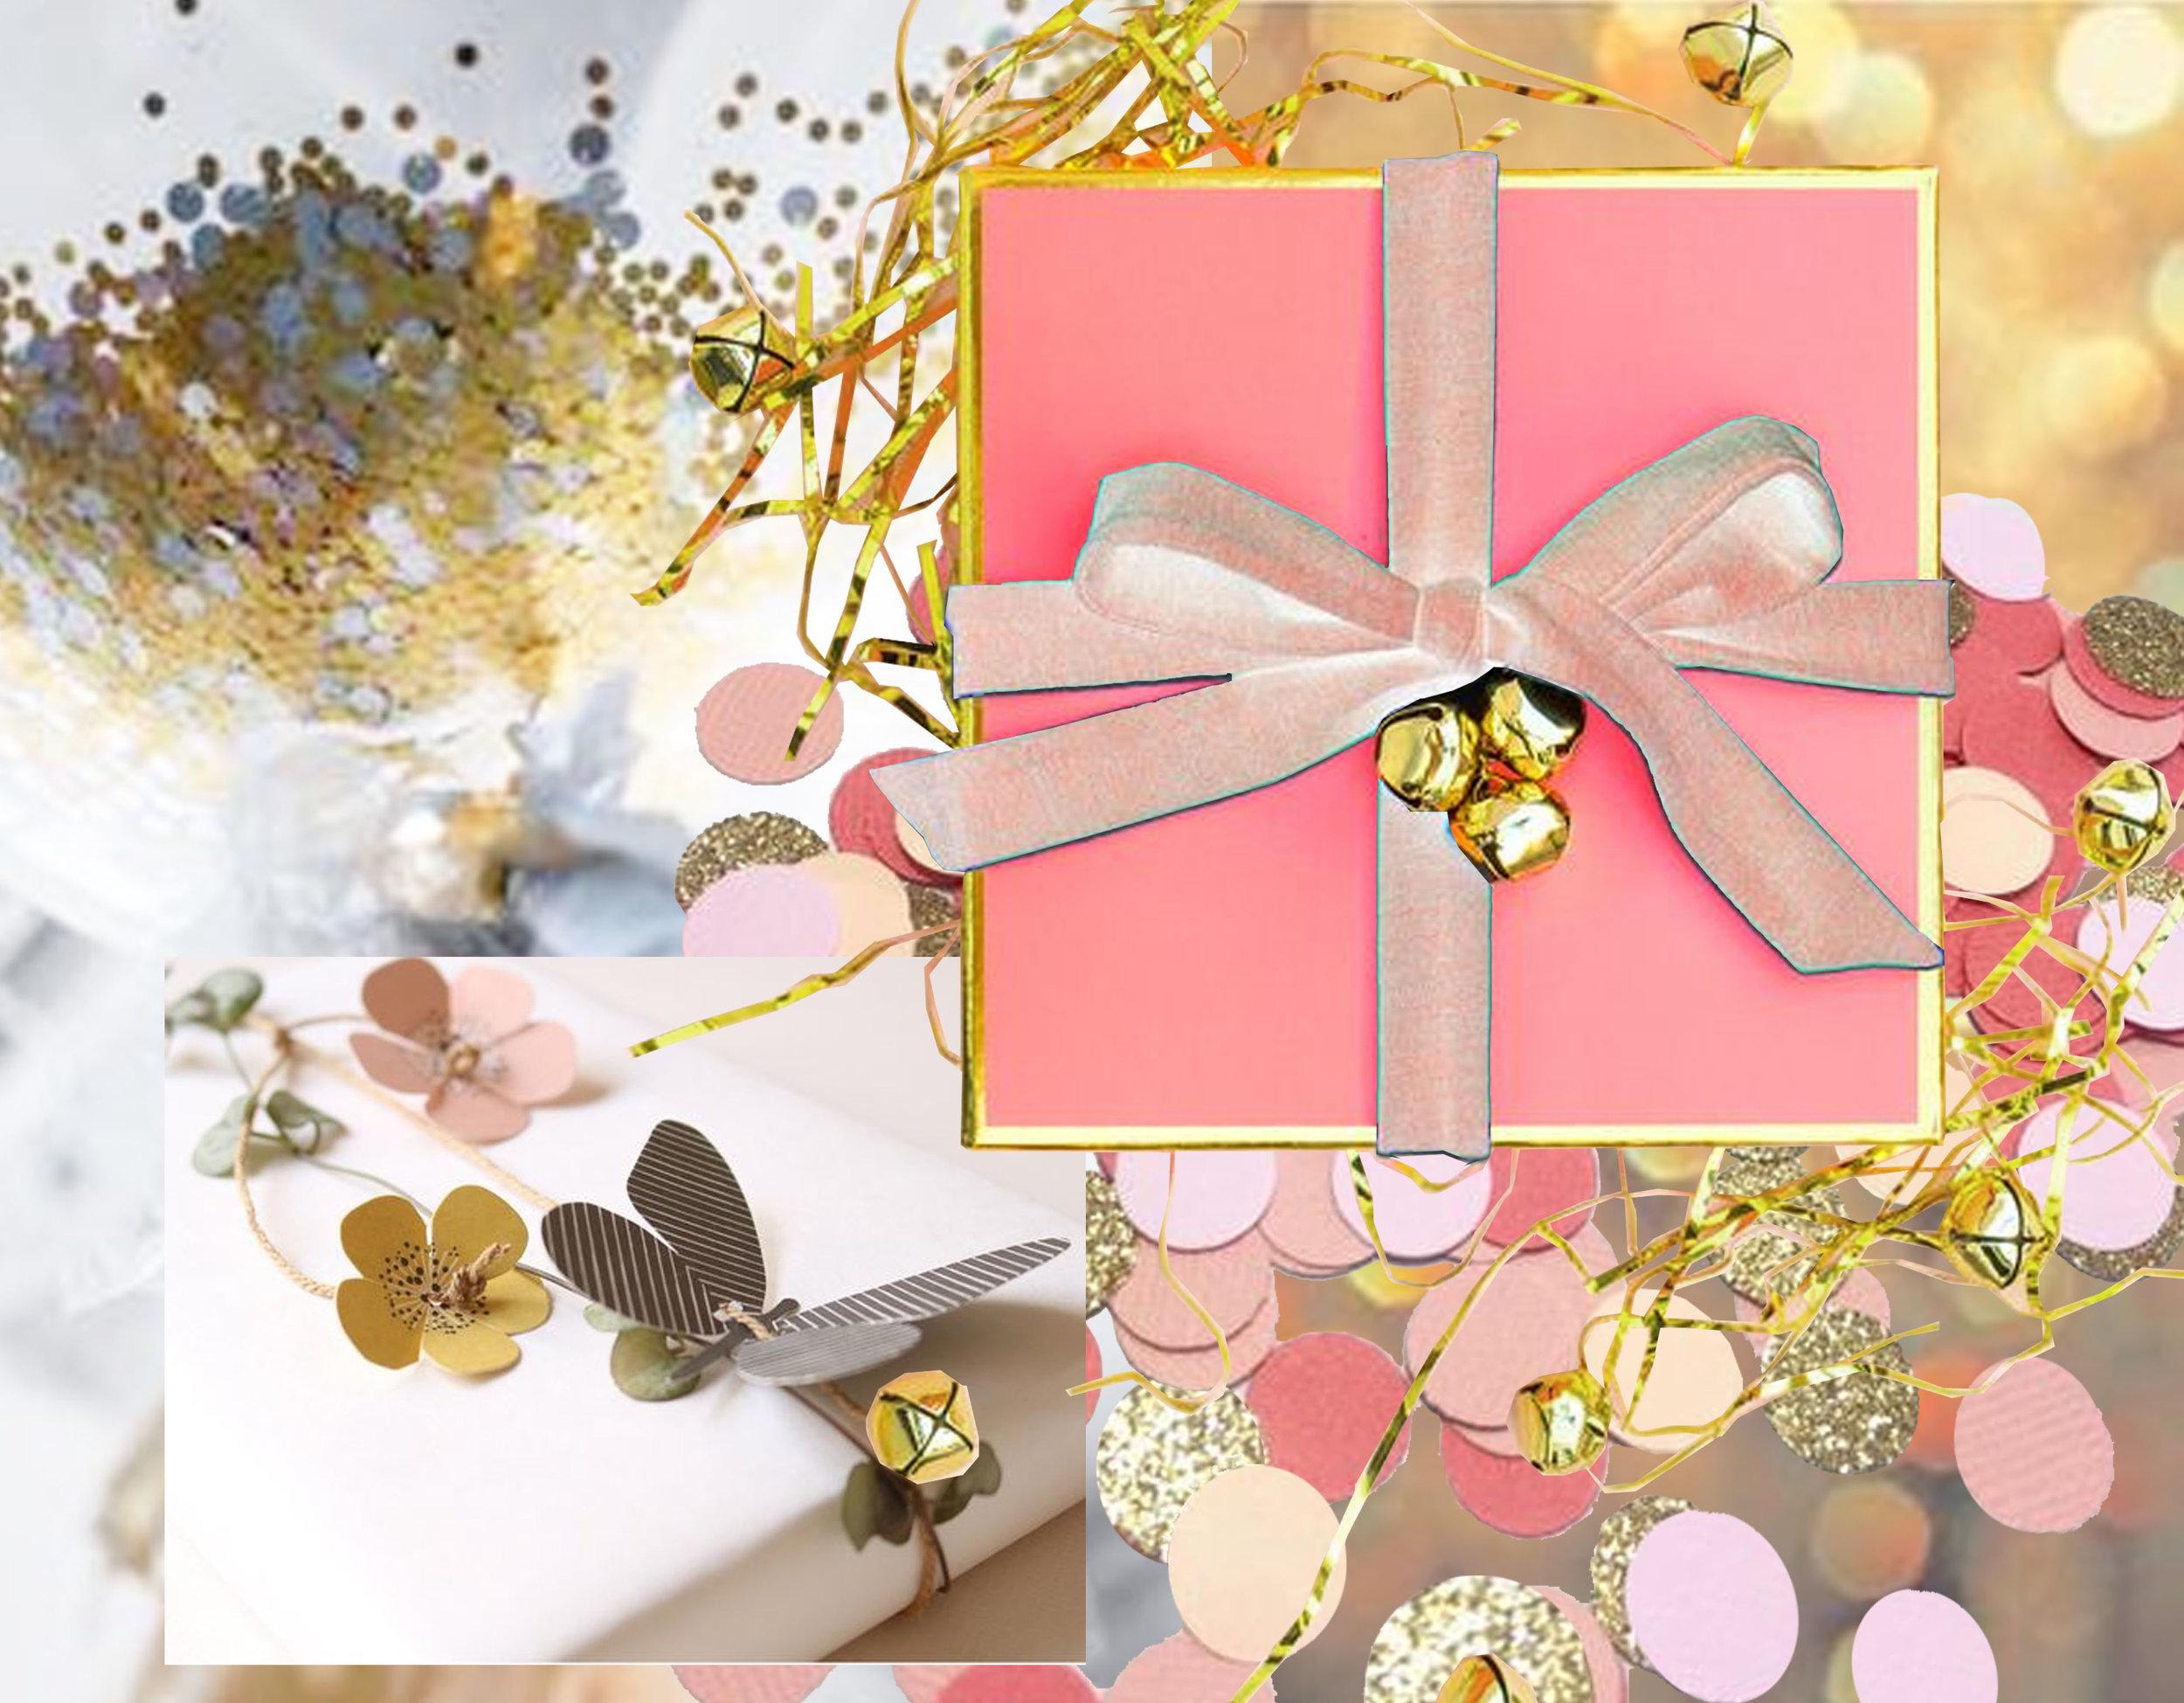 ballon with gold confetti via T he 36th Avenue  - wrapping idea box via  Sarah Hearts  - colorful confetti via  Paper Confetti  - decorative wrapping ribbon Fields of Joy  Jurianne Matter